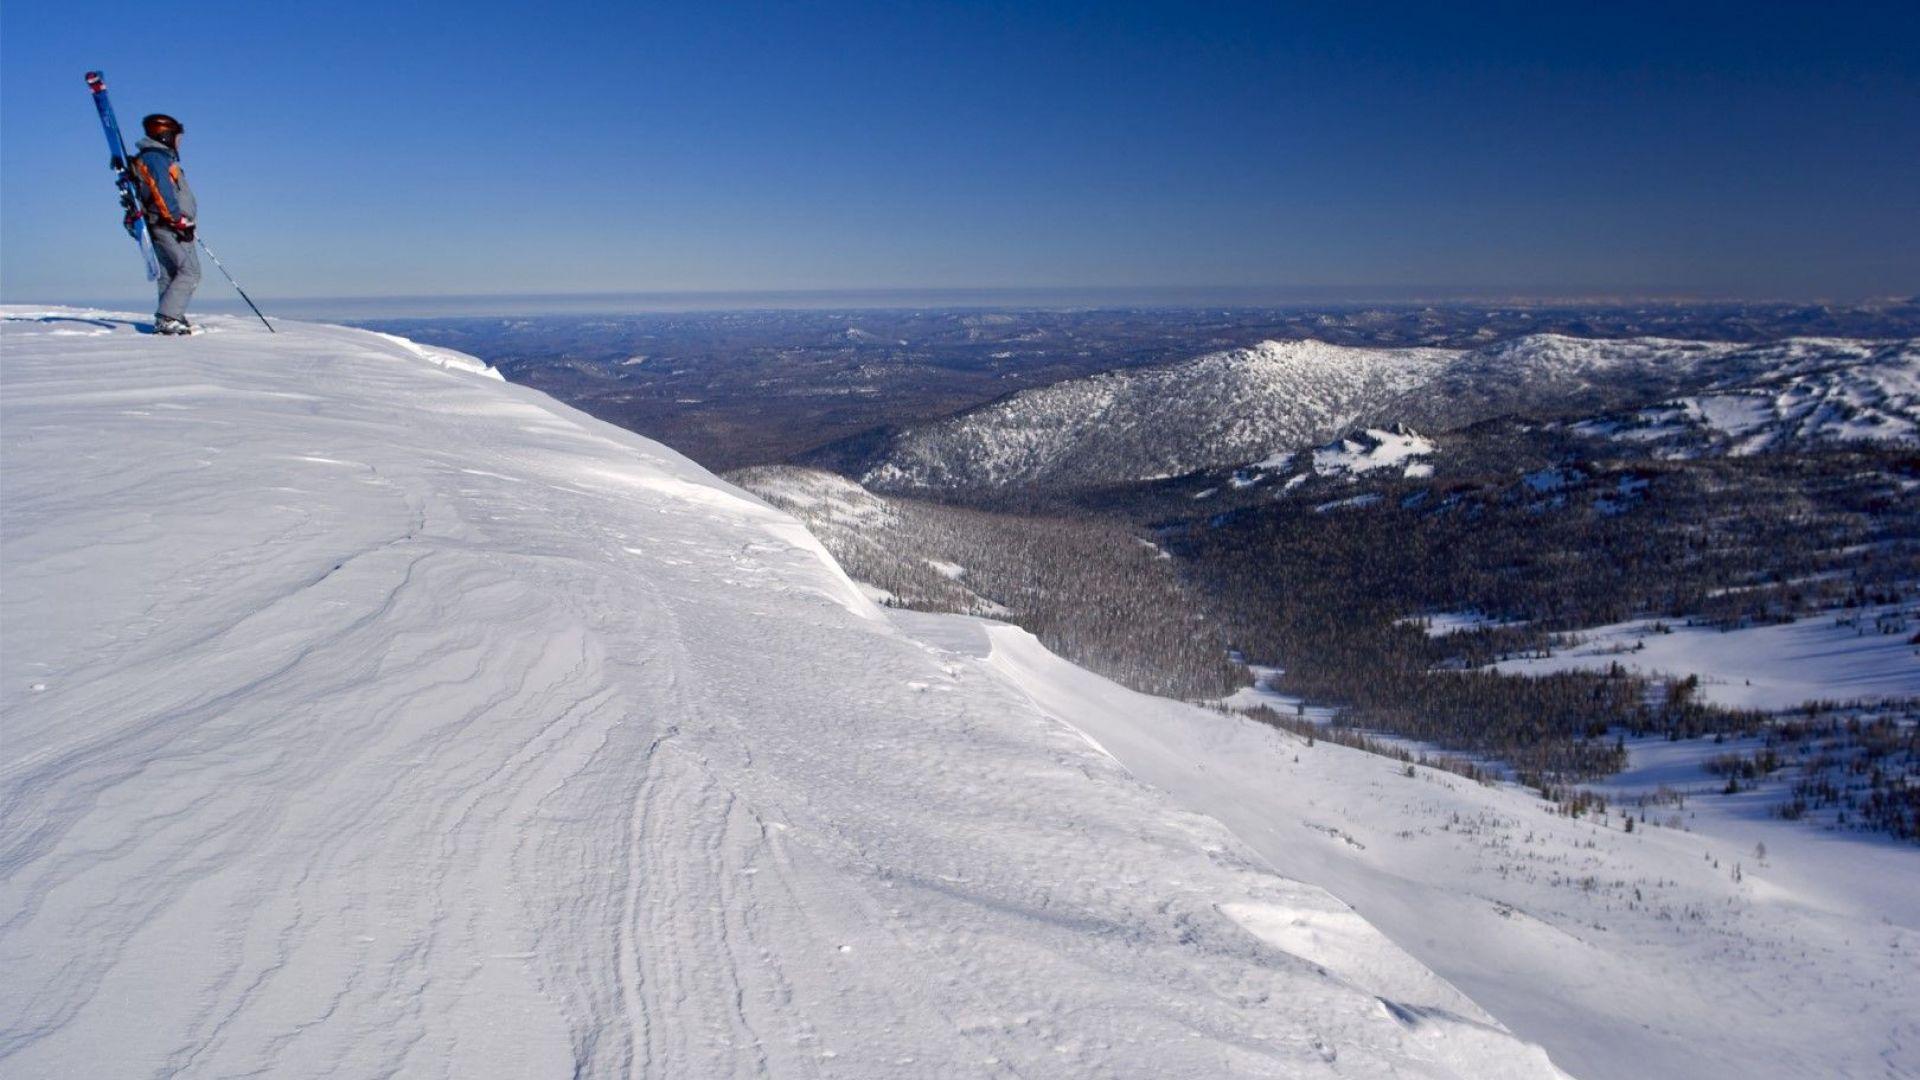 Сибирски ски курорт се надява този сезон да замени Алпите